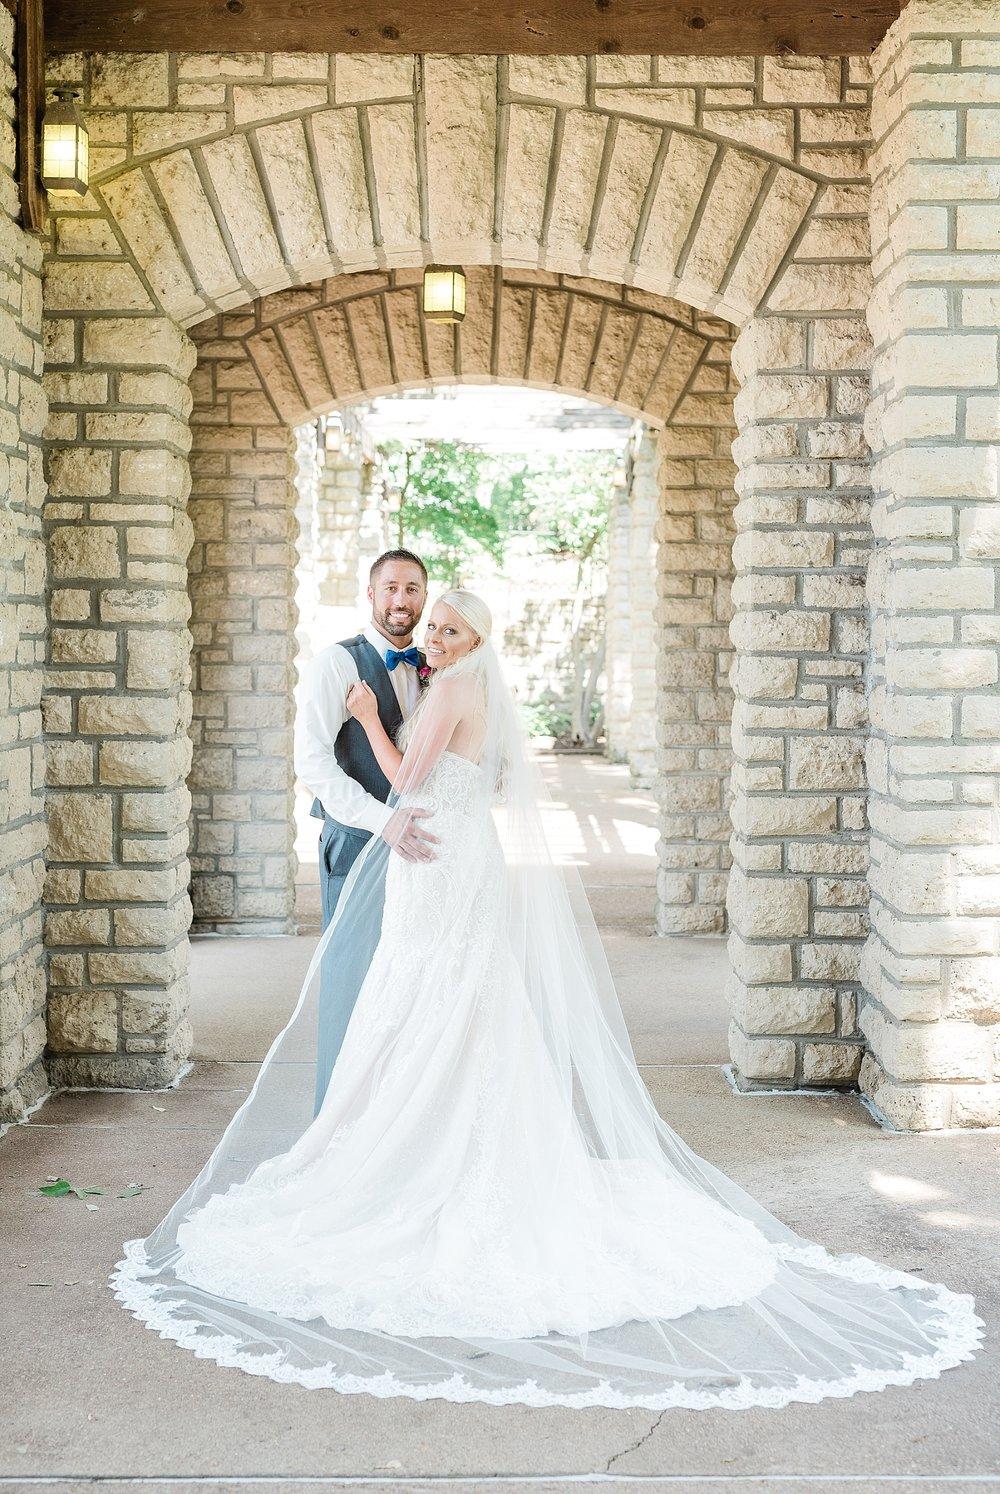 Alan and Heather Horn Wedding by Kelsi Kliethermes Photography Associate - Rachel_0040.jpg